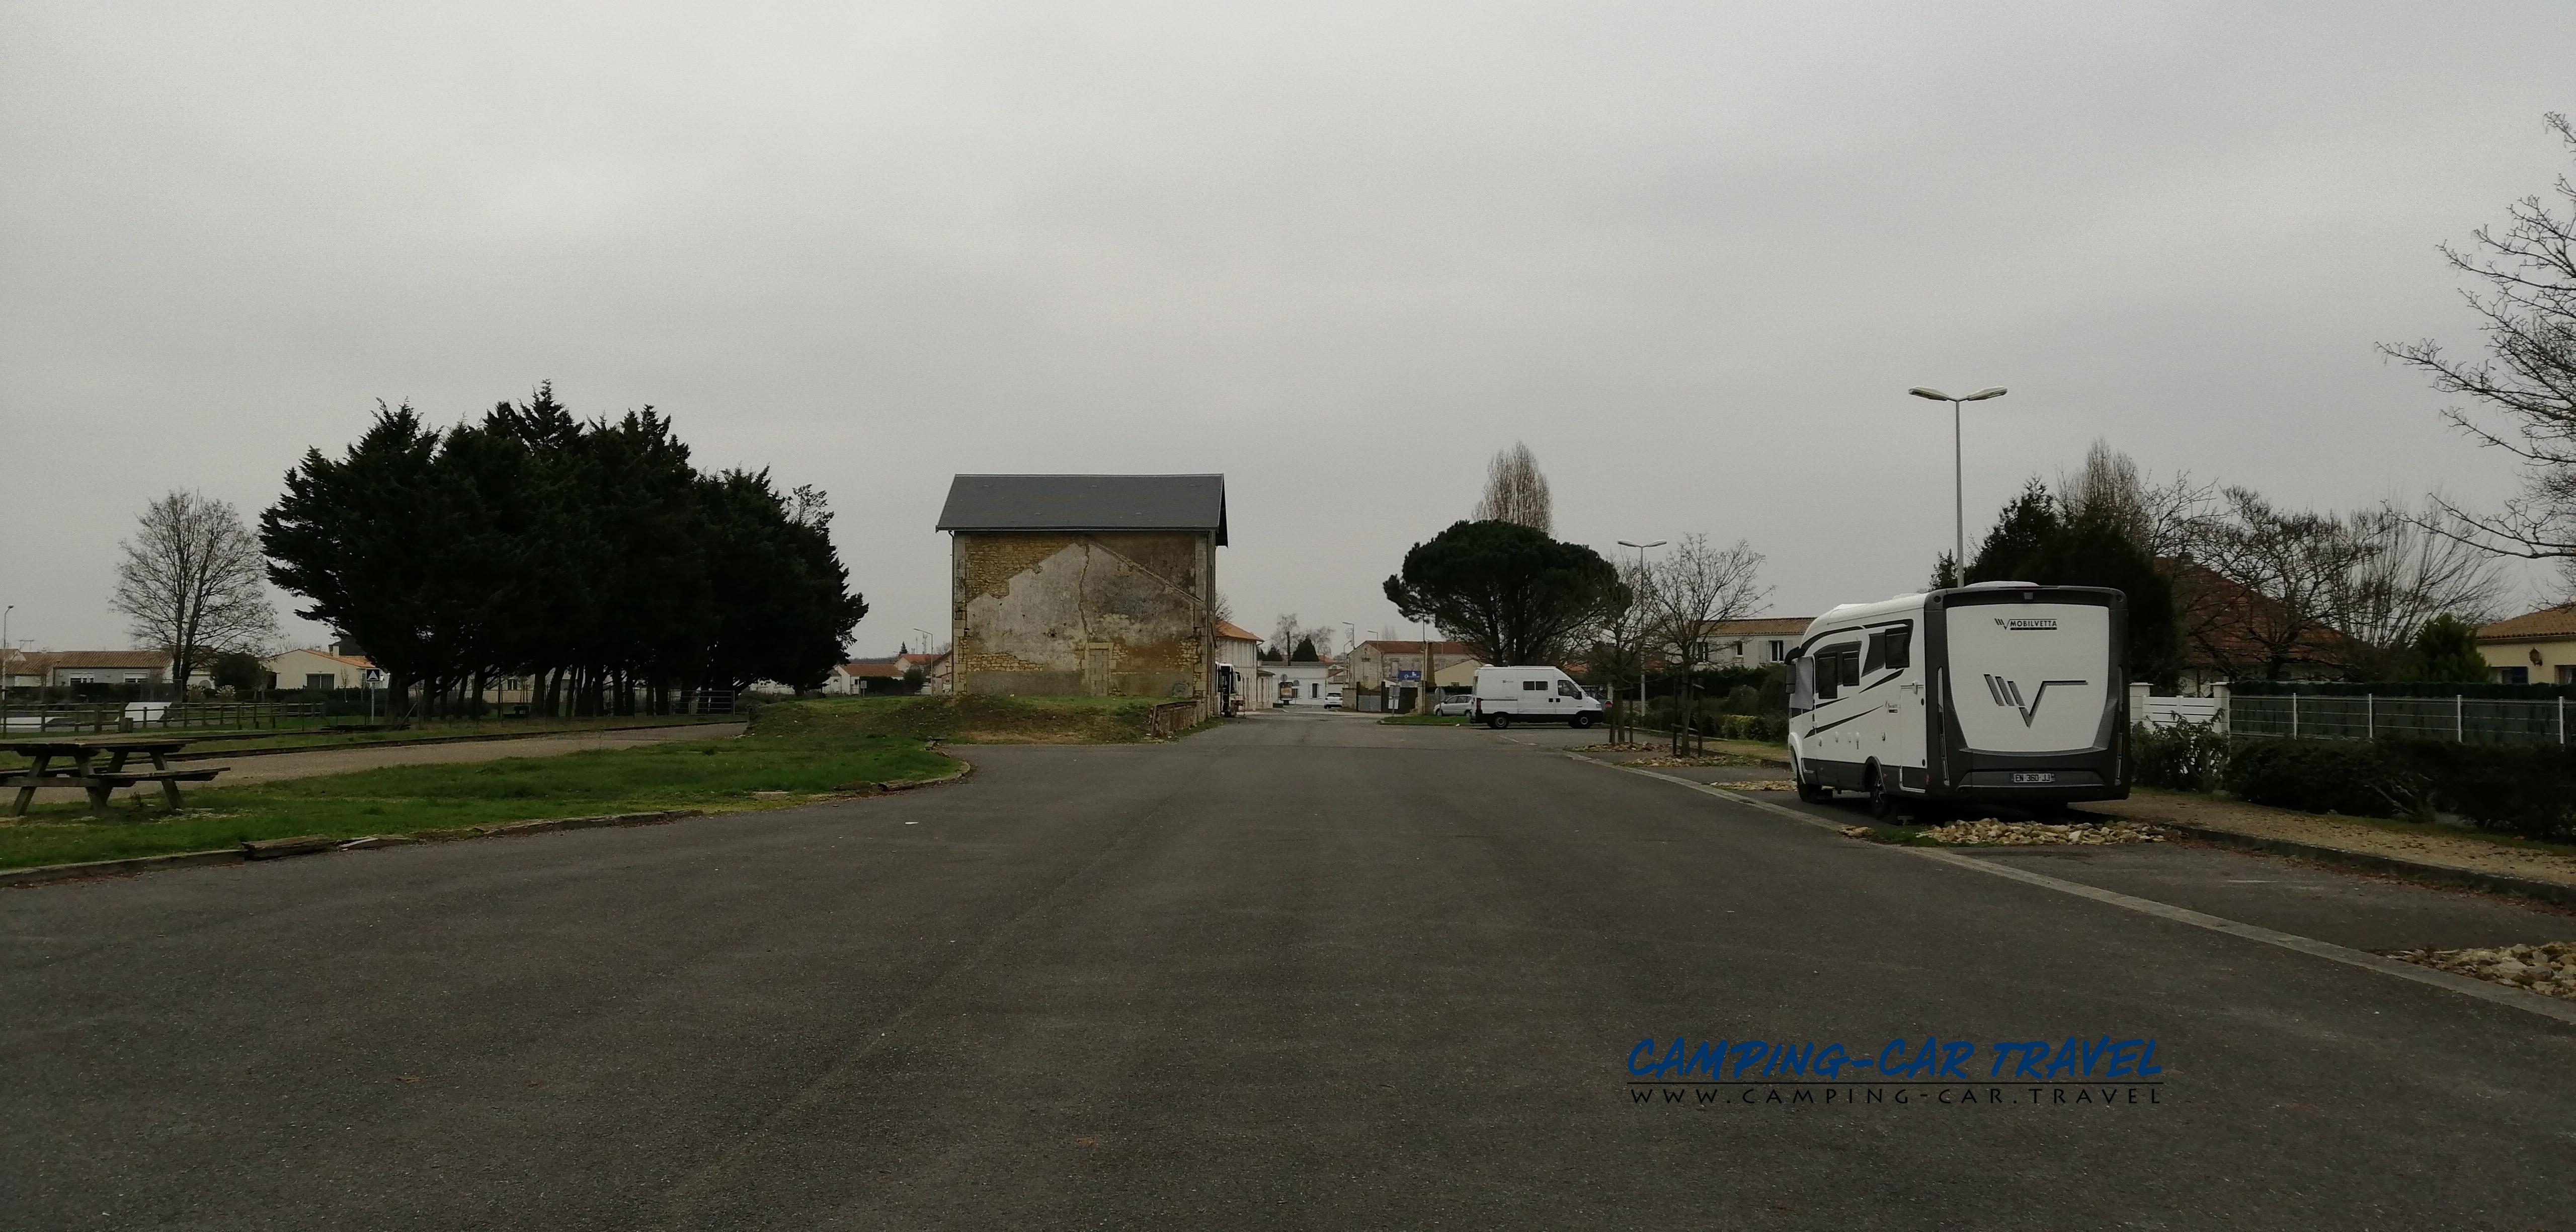 aire services camping car Cozes Charente-Maritime Poitou-Charentes